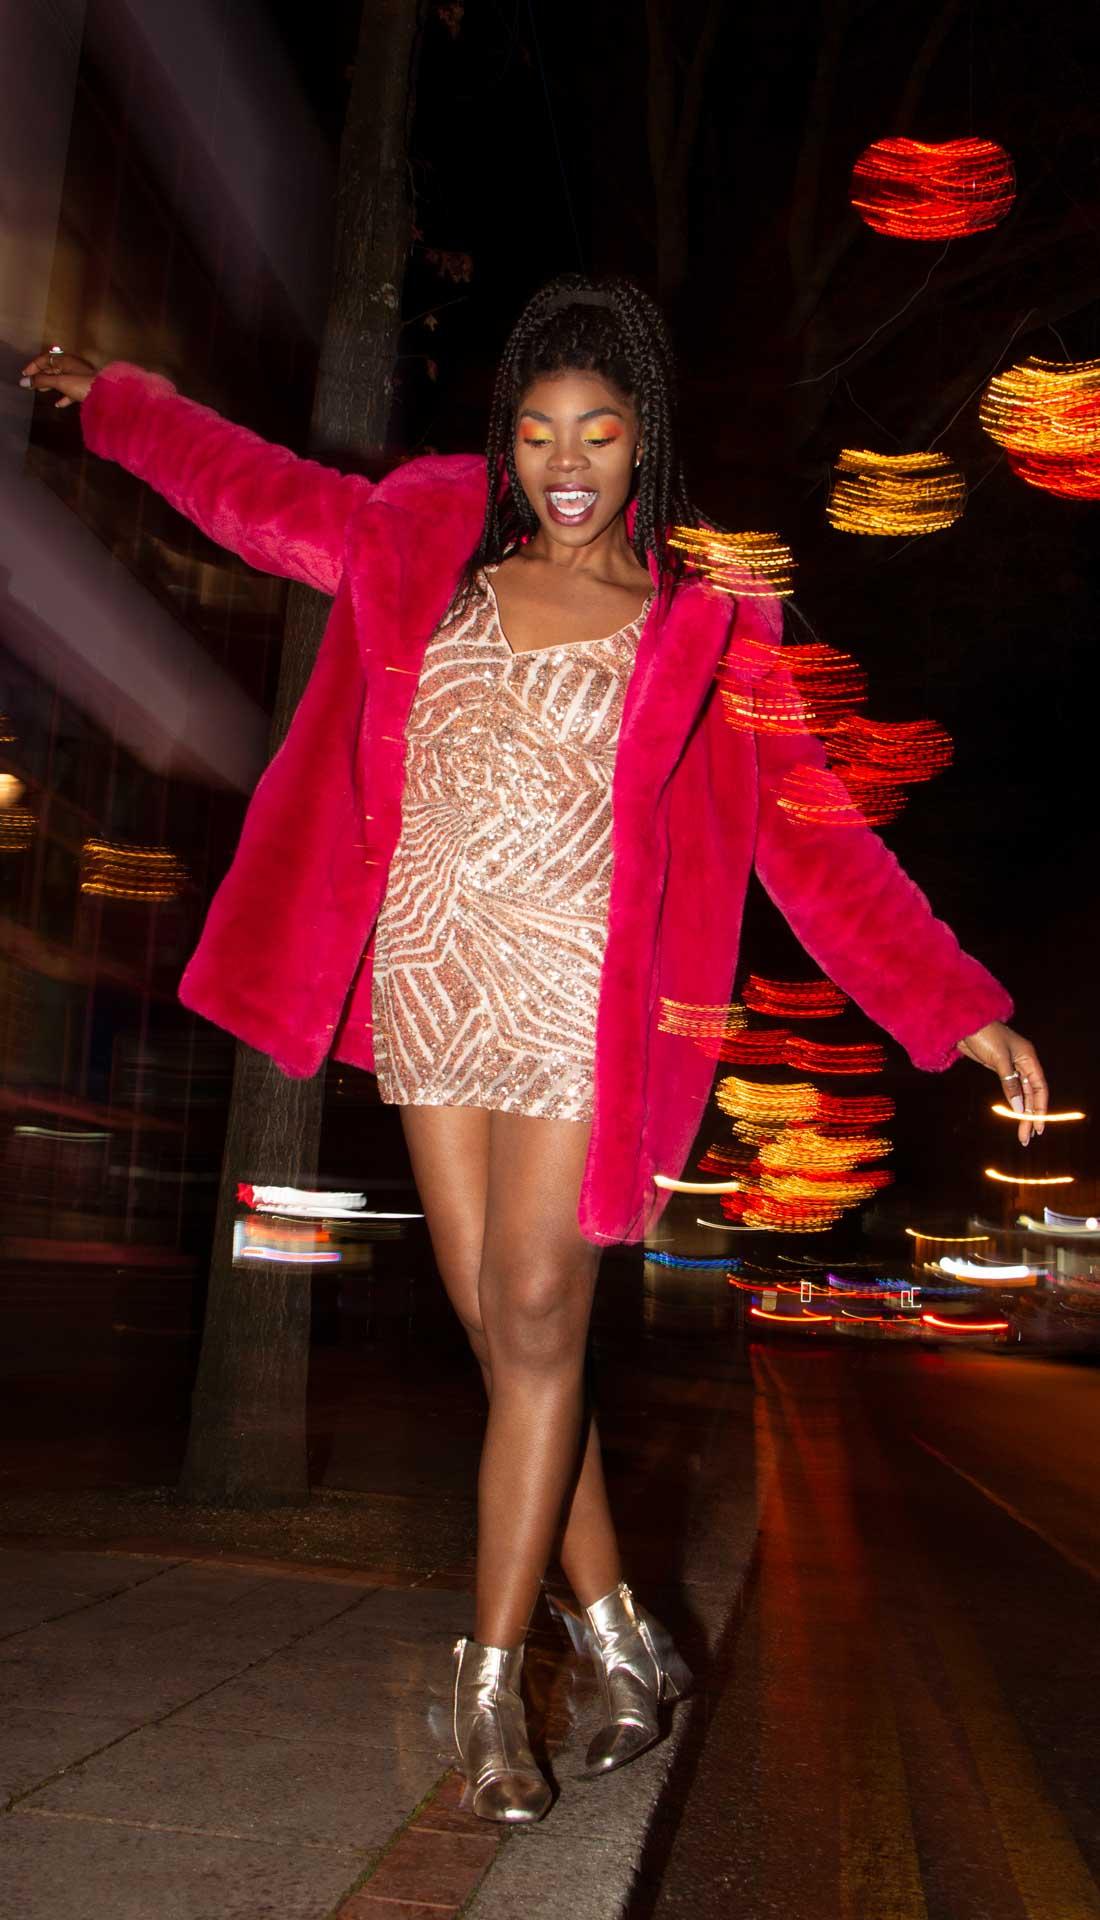 Street fashion photoshoot, evening wear women's fashion, fashion photography Birmingham UK, commercial photographer West Midlands